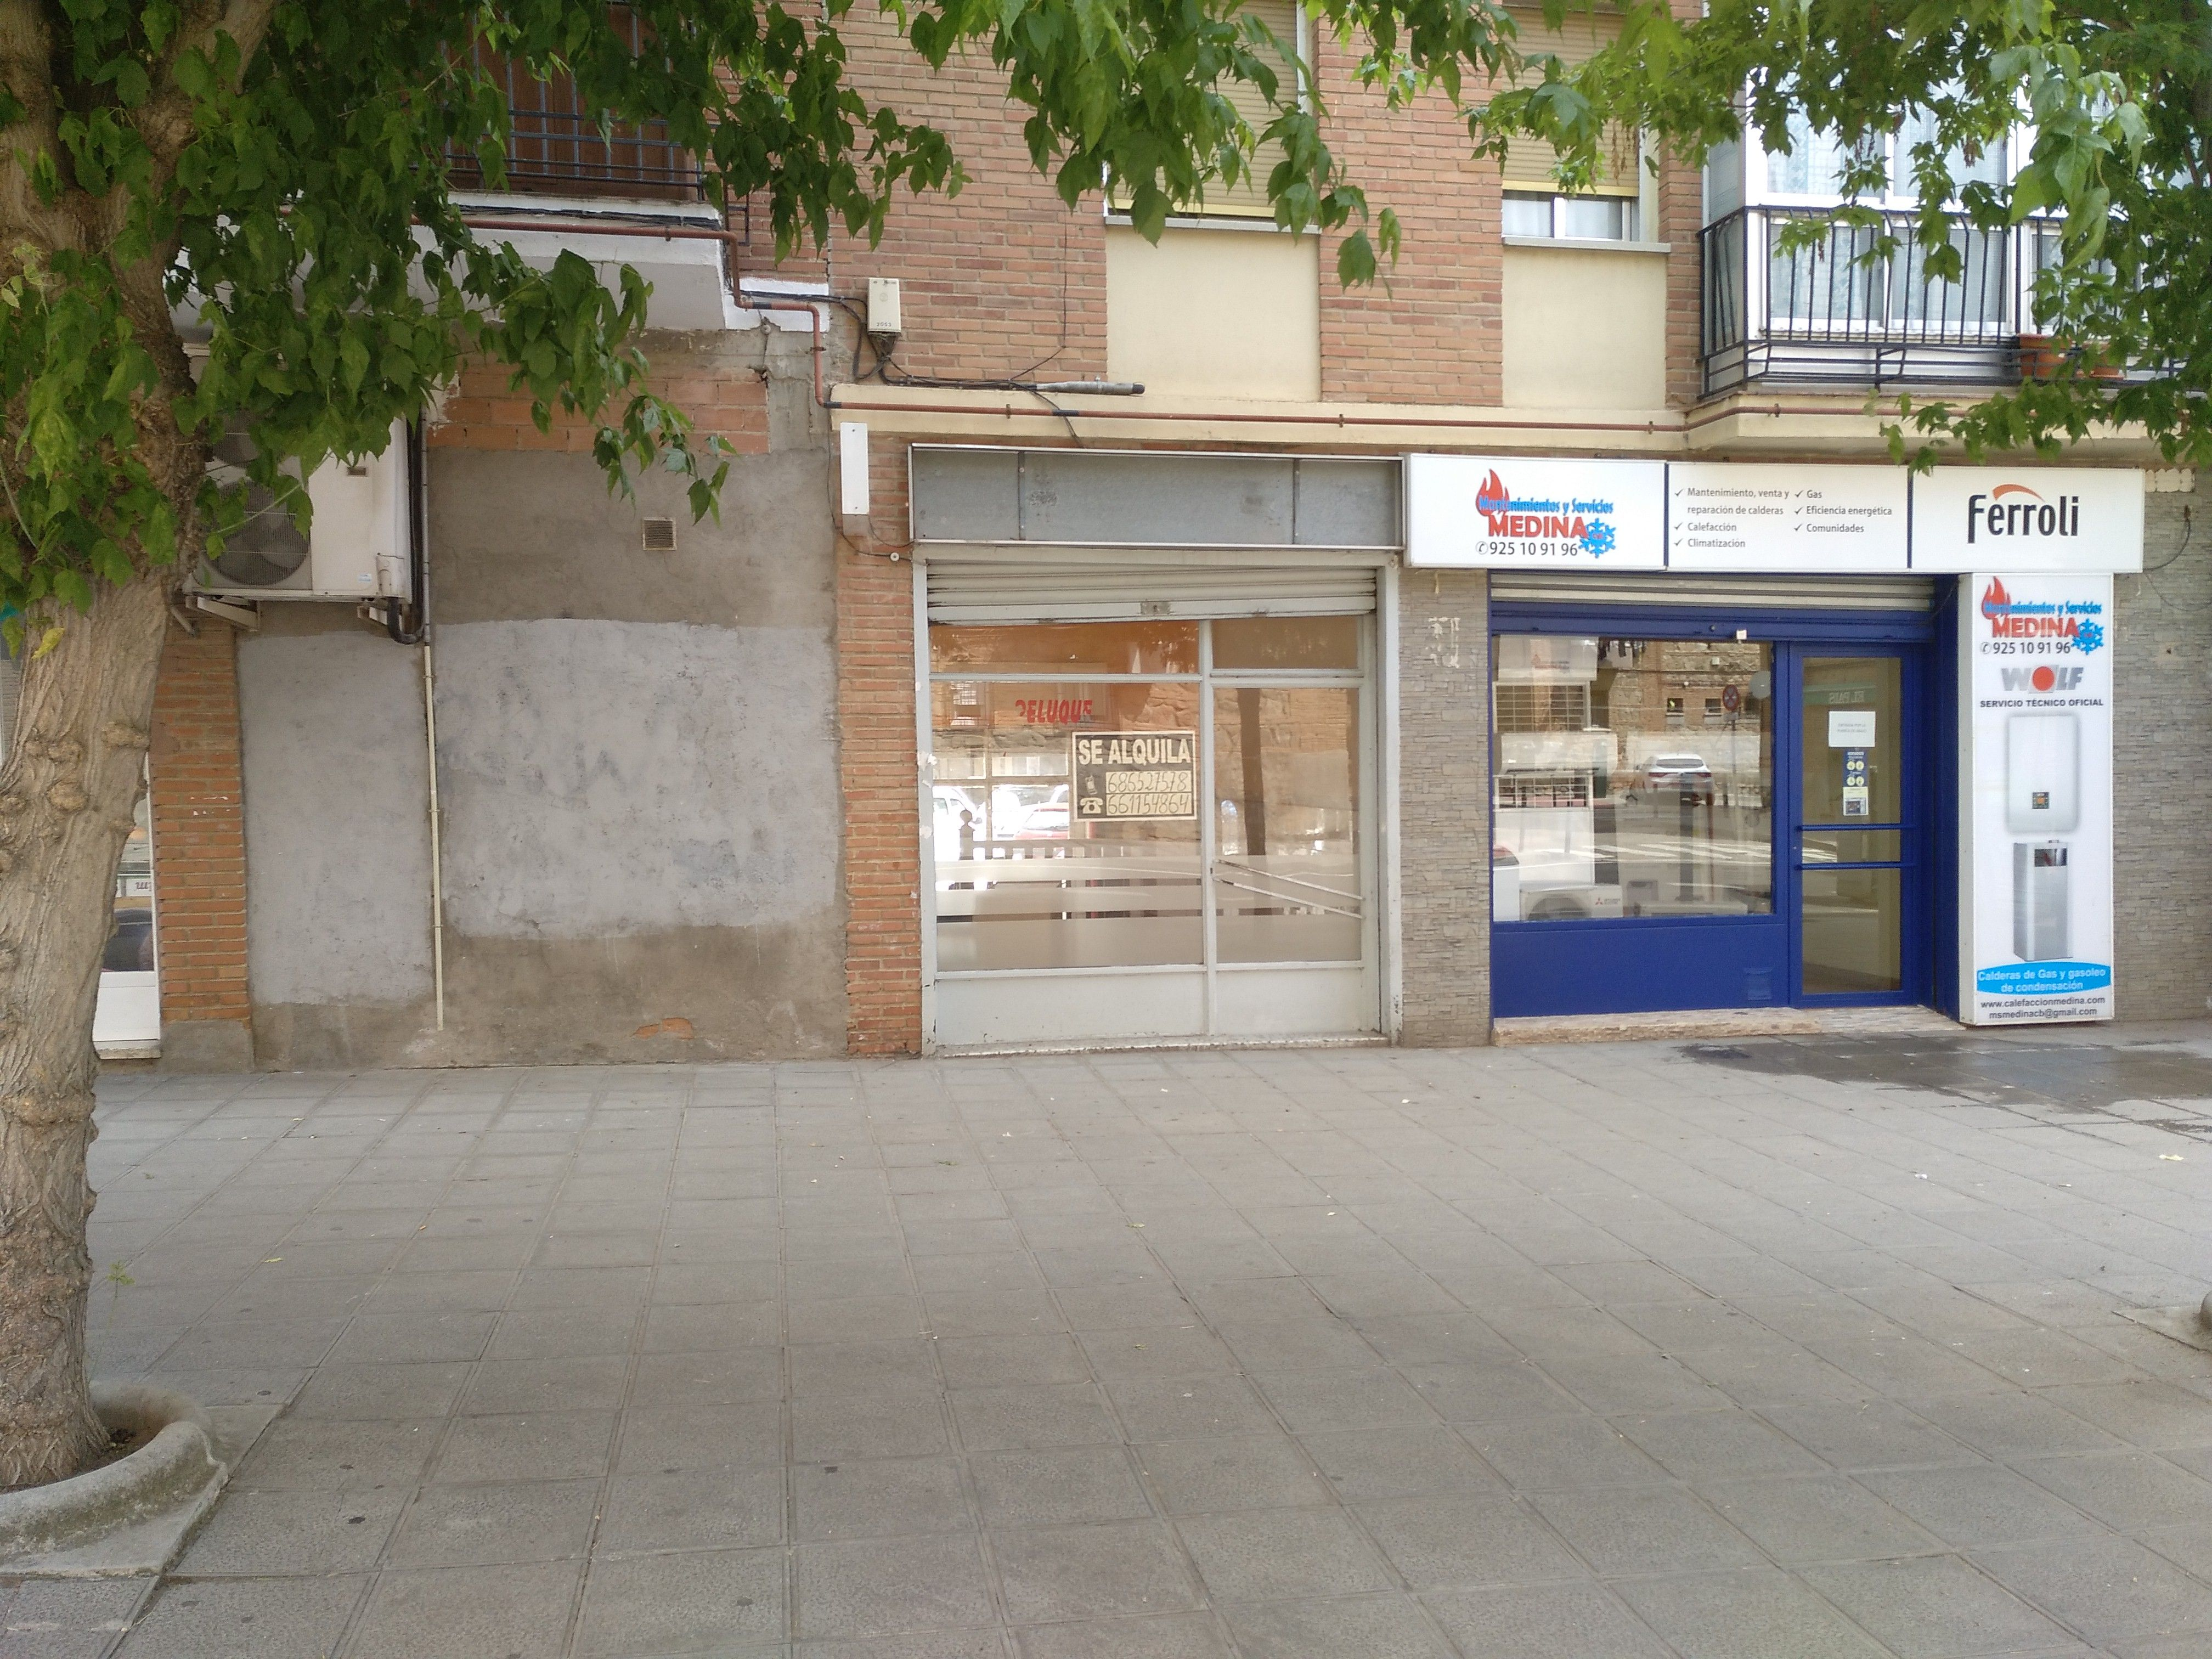 Alquiler de locales comerciales en Toledo